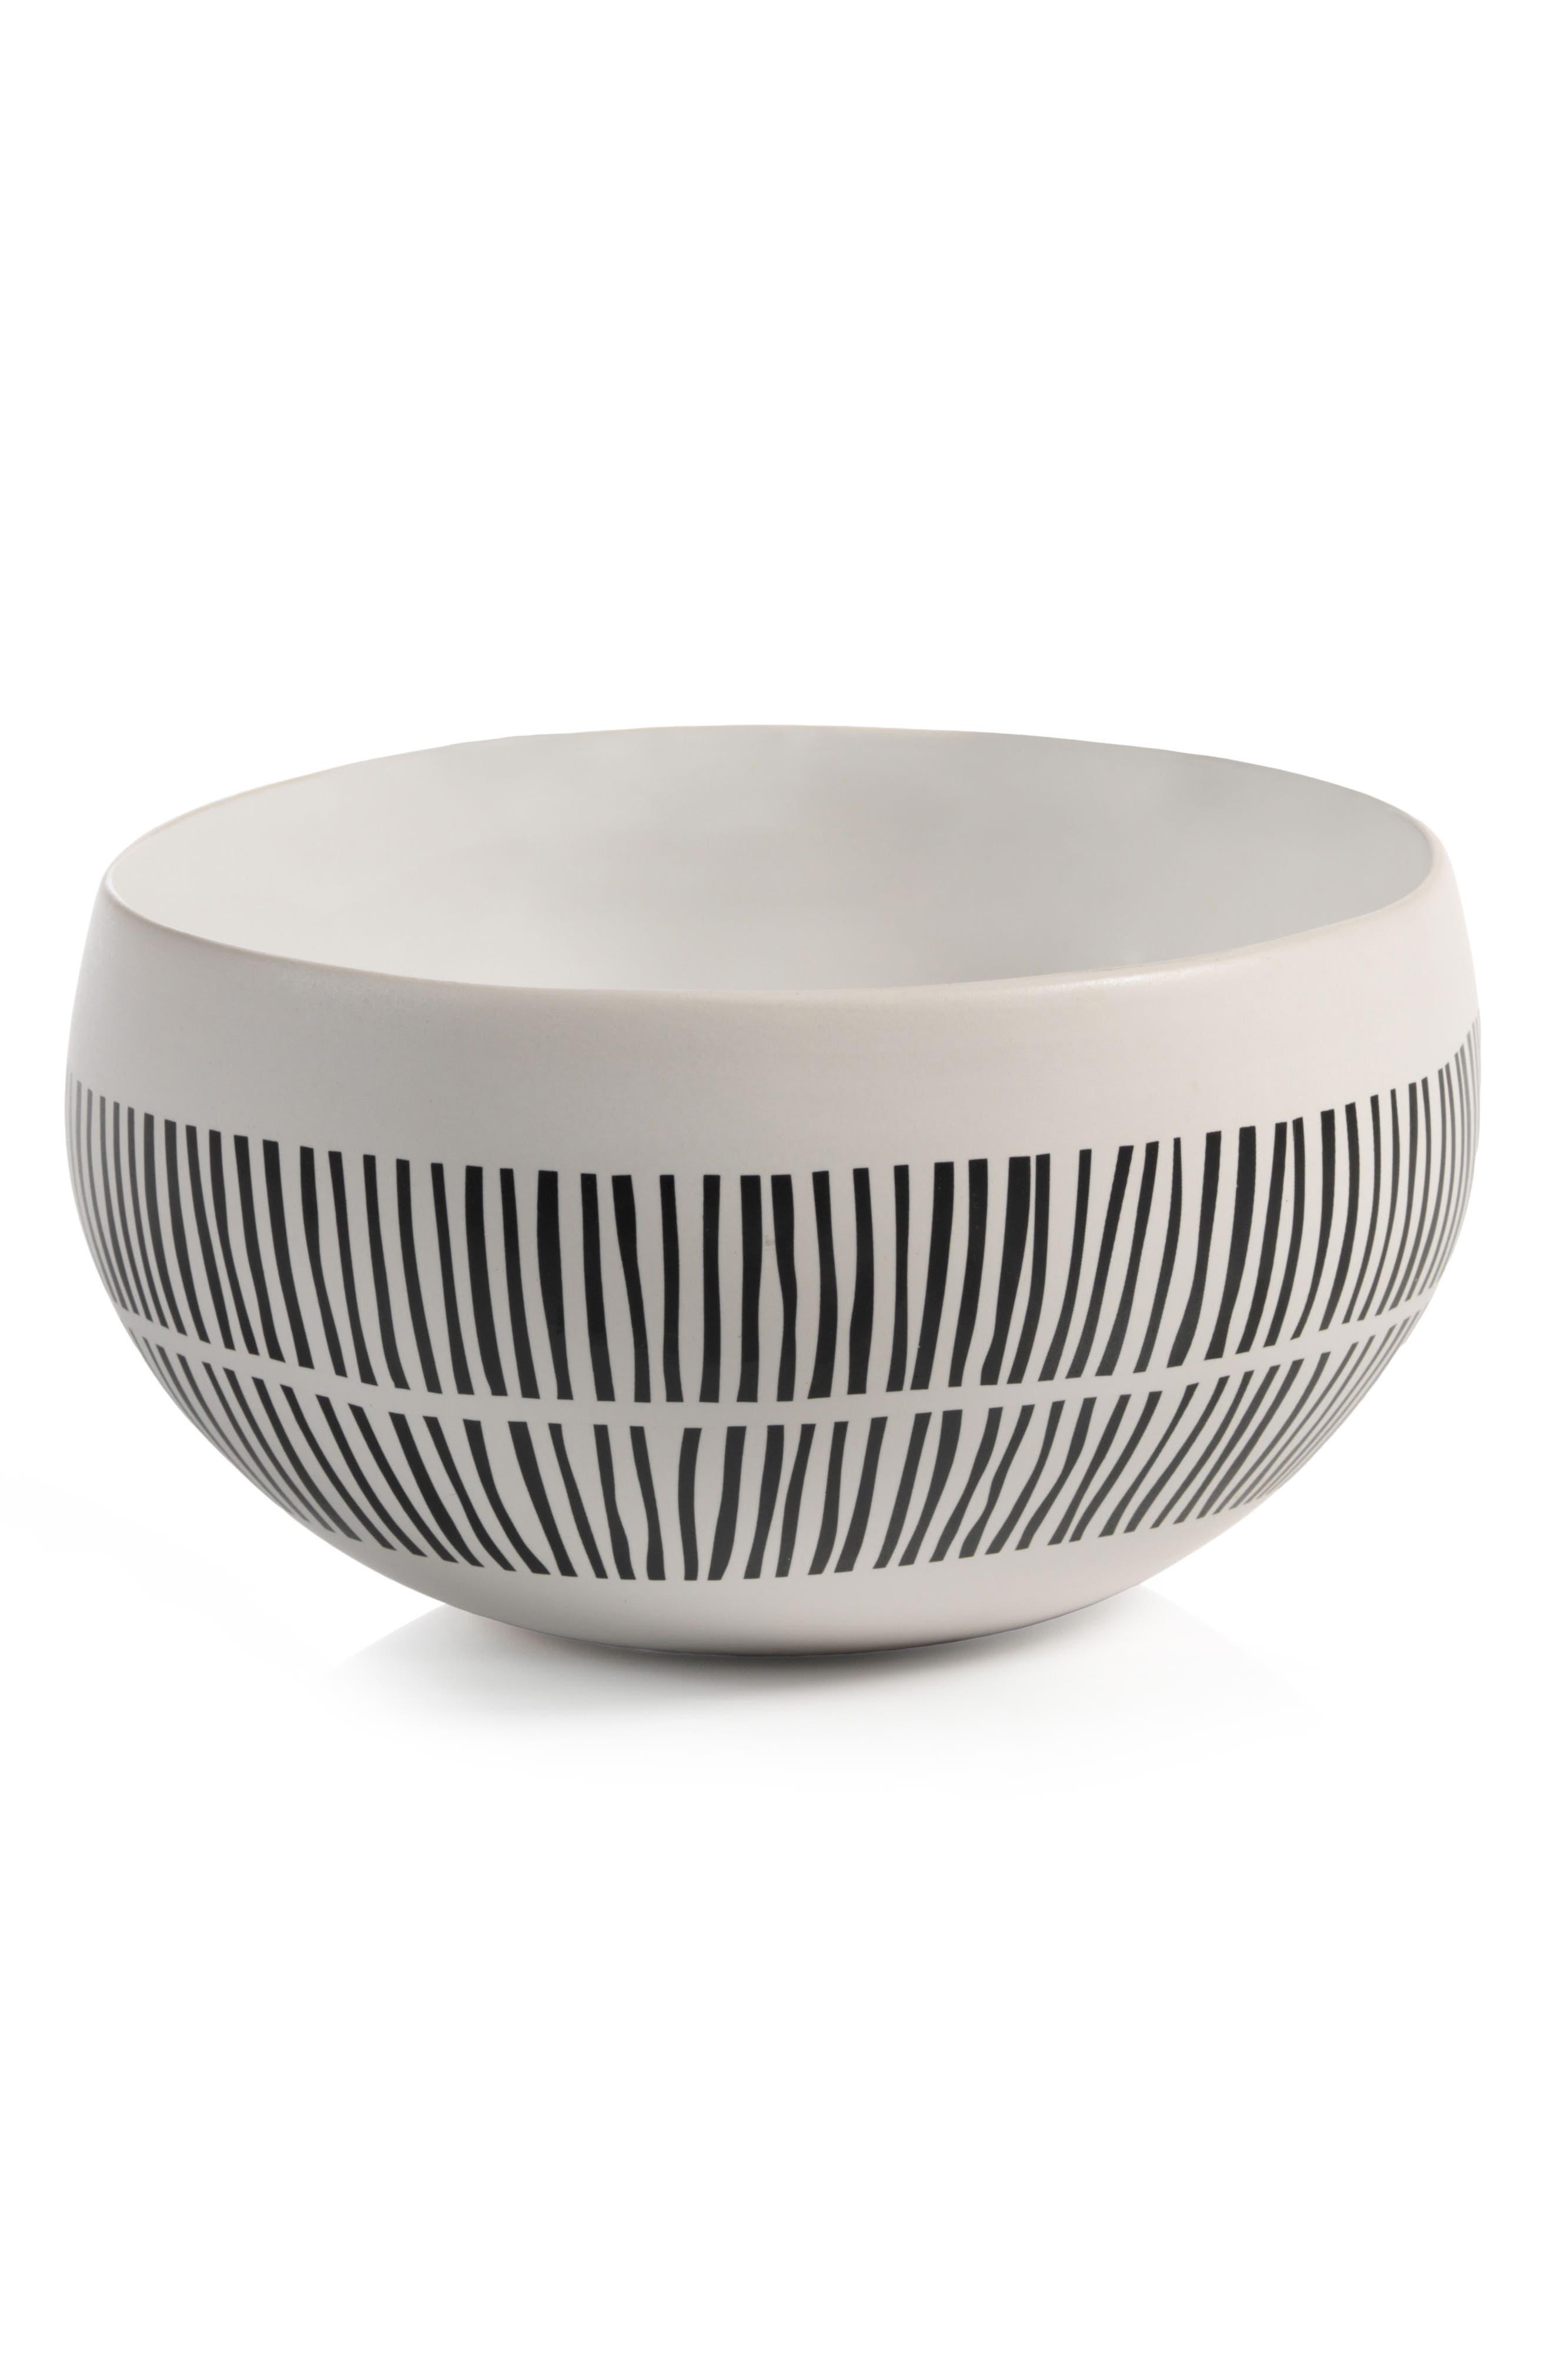 Marquesa Ceramic Bowl,                         Main,                         color, 100